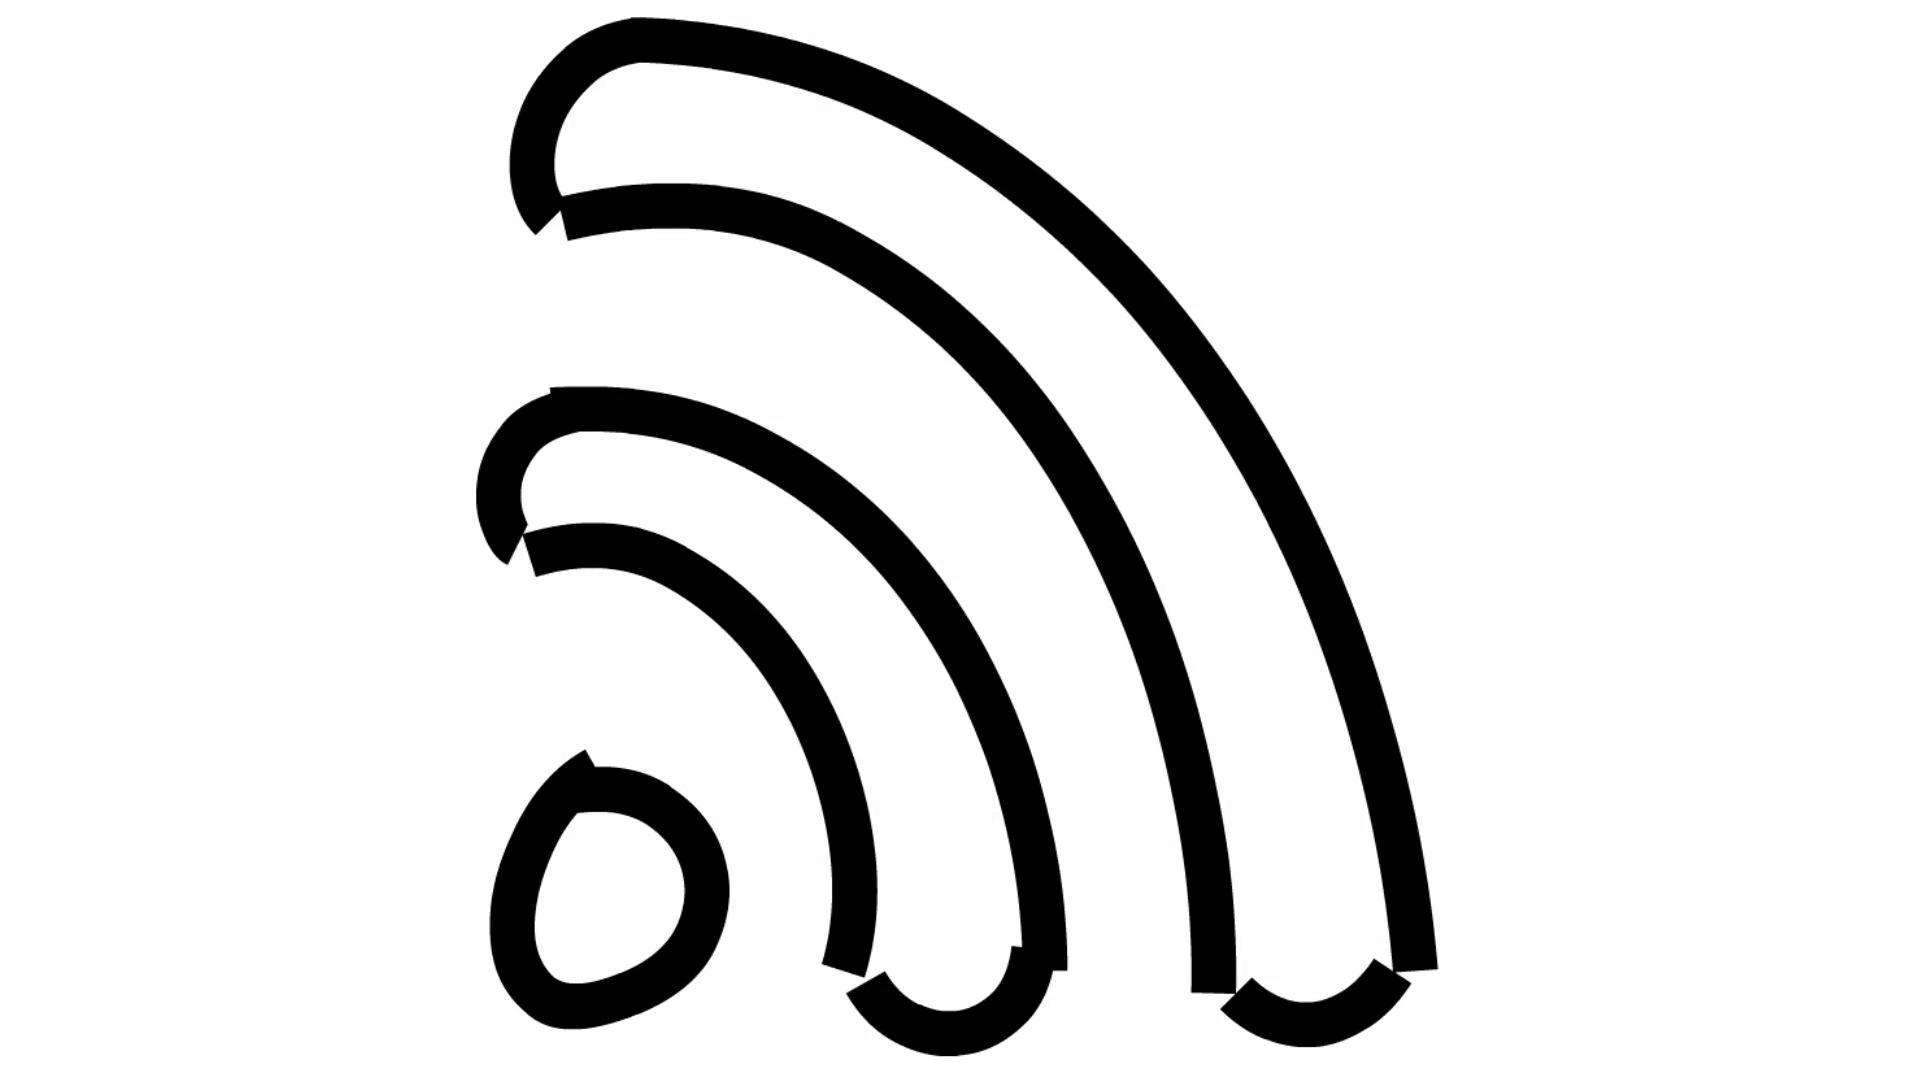 Wifi Signal Line Drawing Illustration Animation With Transparent Background Motion Background Storyblocks